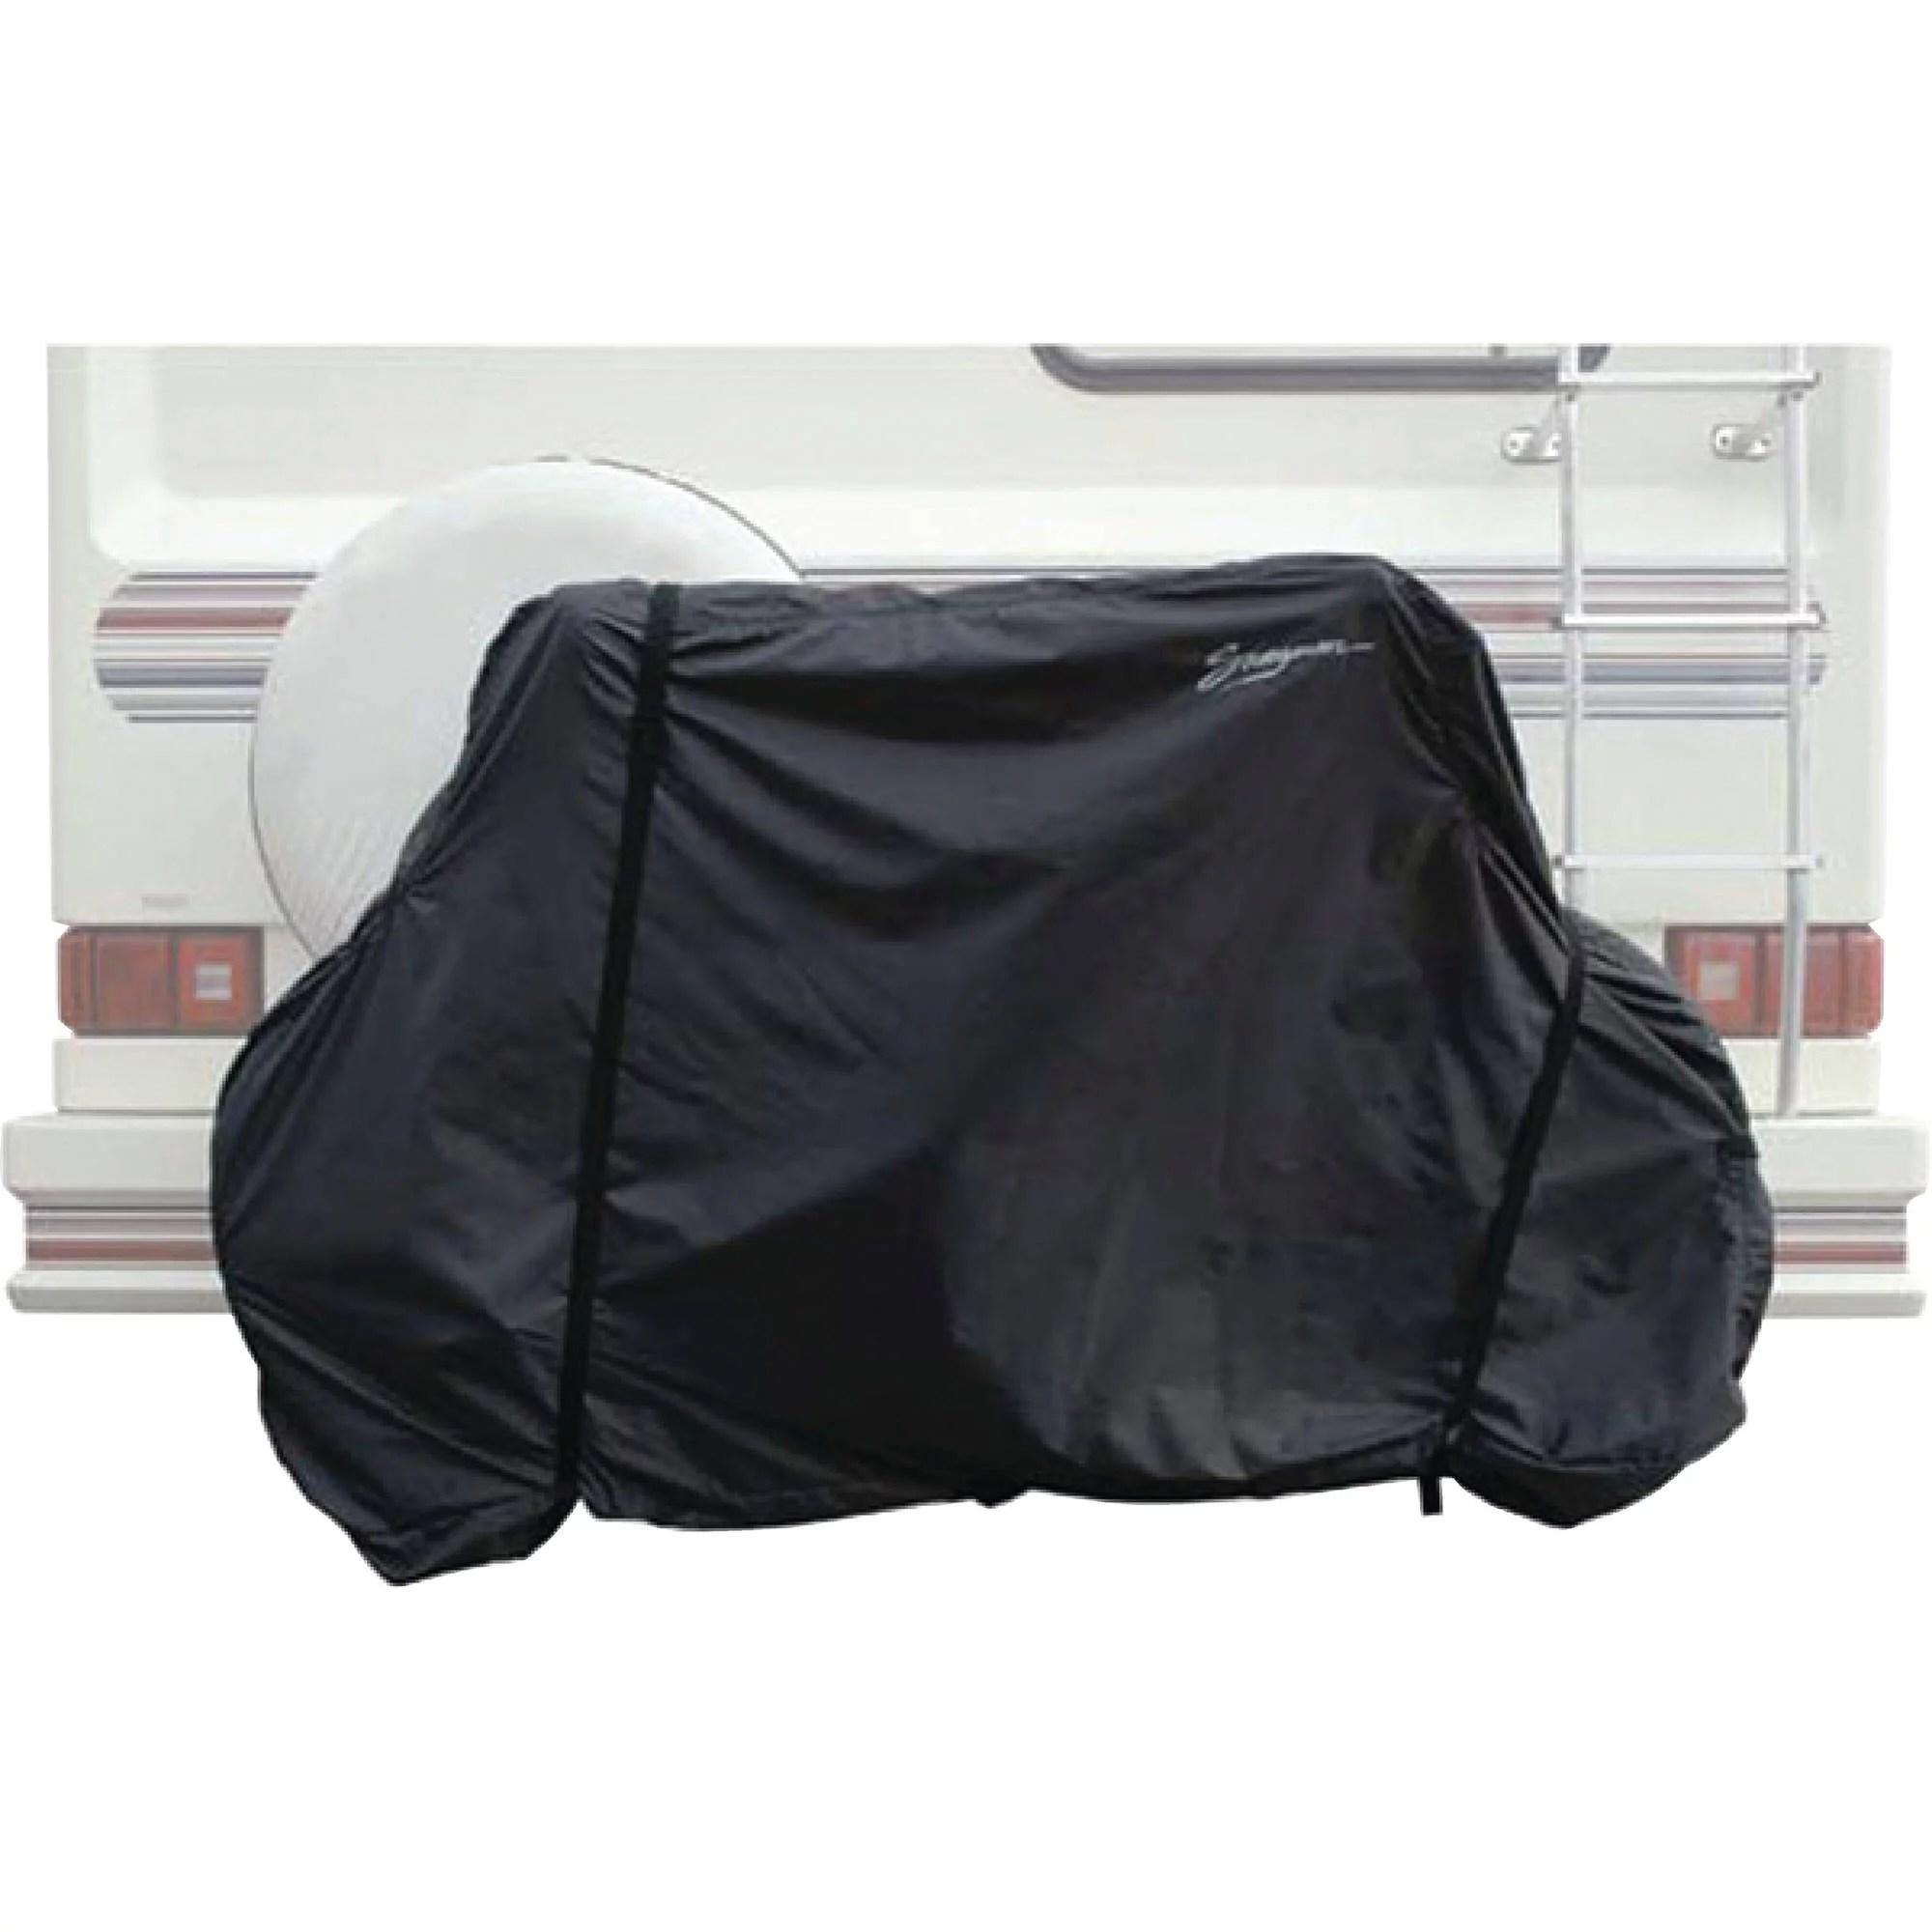 swagman 82006 black horizontal 2 bike rv hitch mount cover bag walmart com